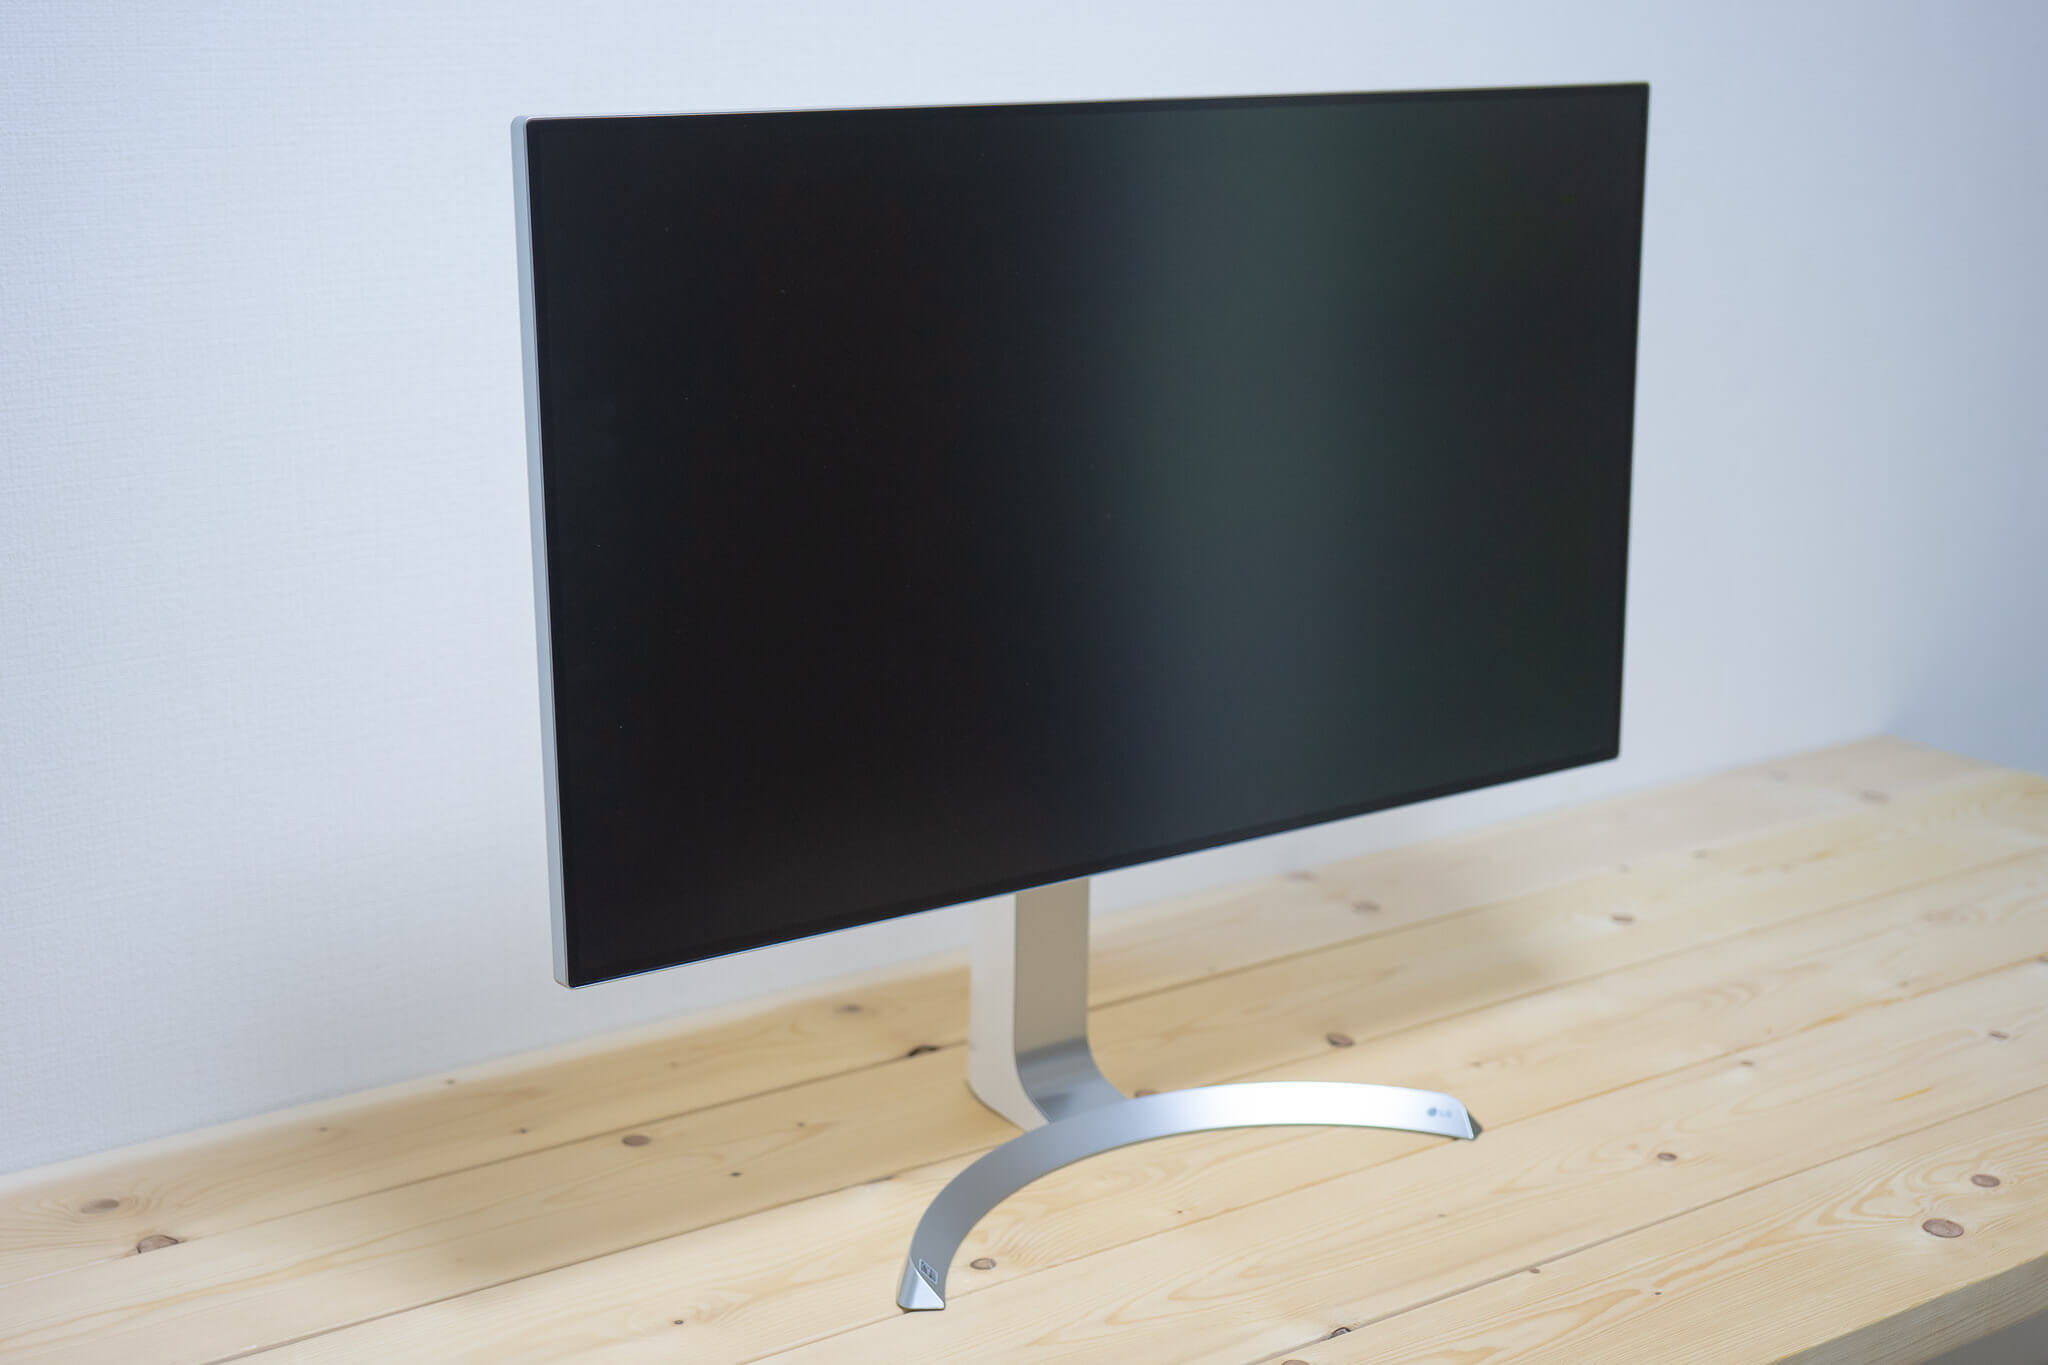 181021 lg display 32ud99w 7